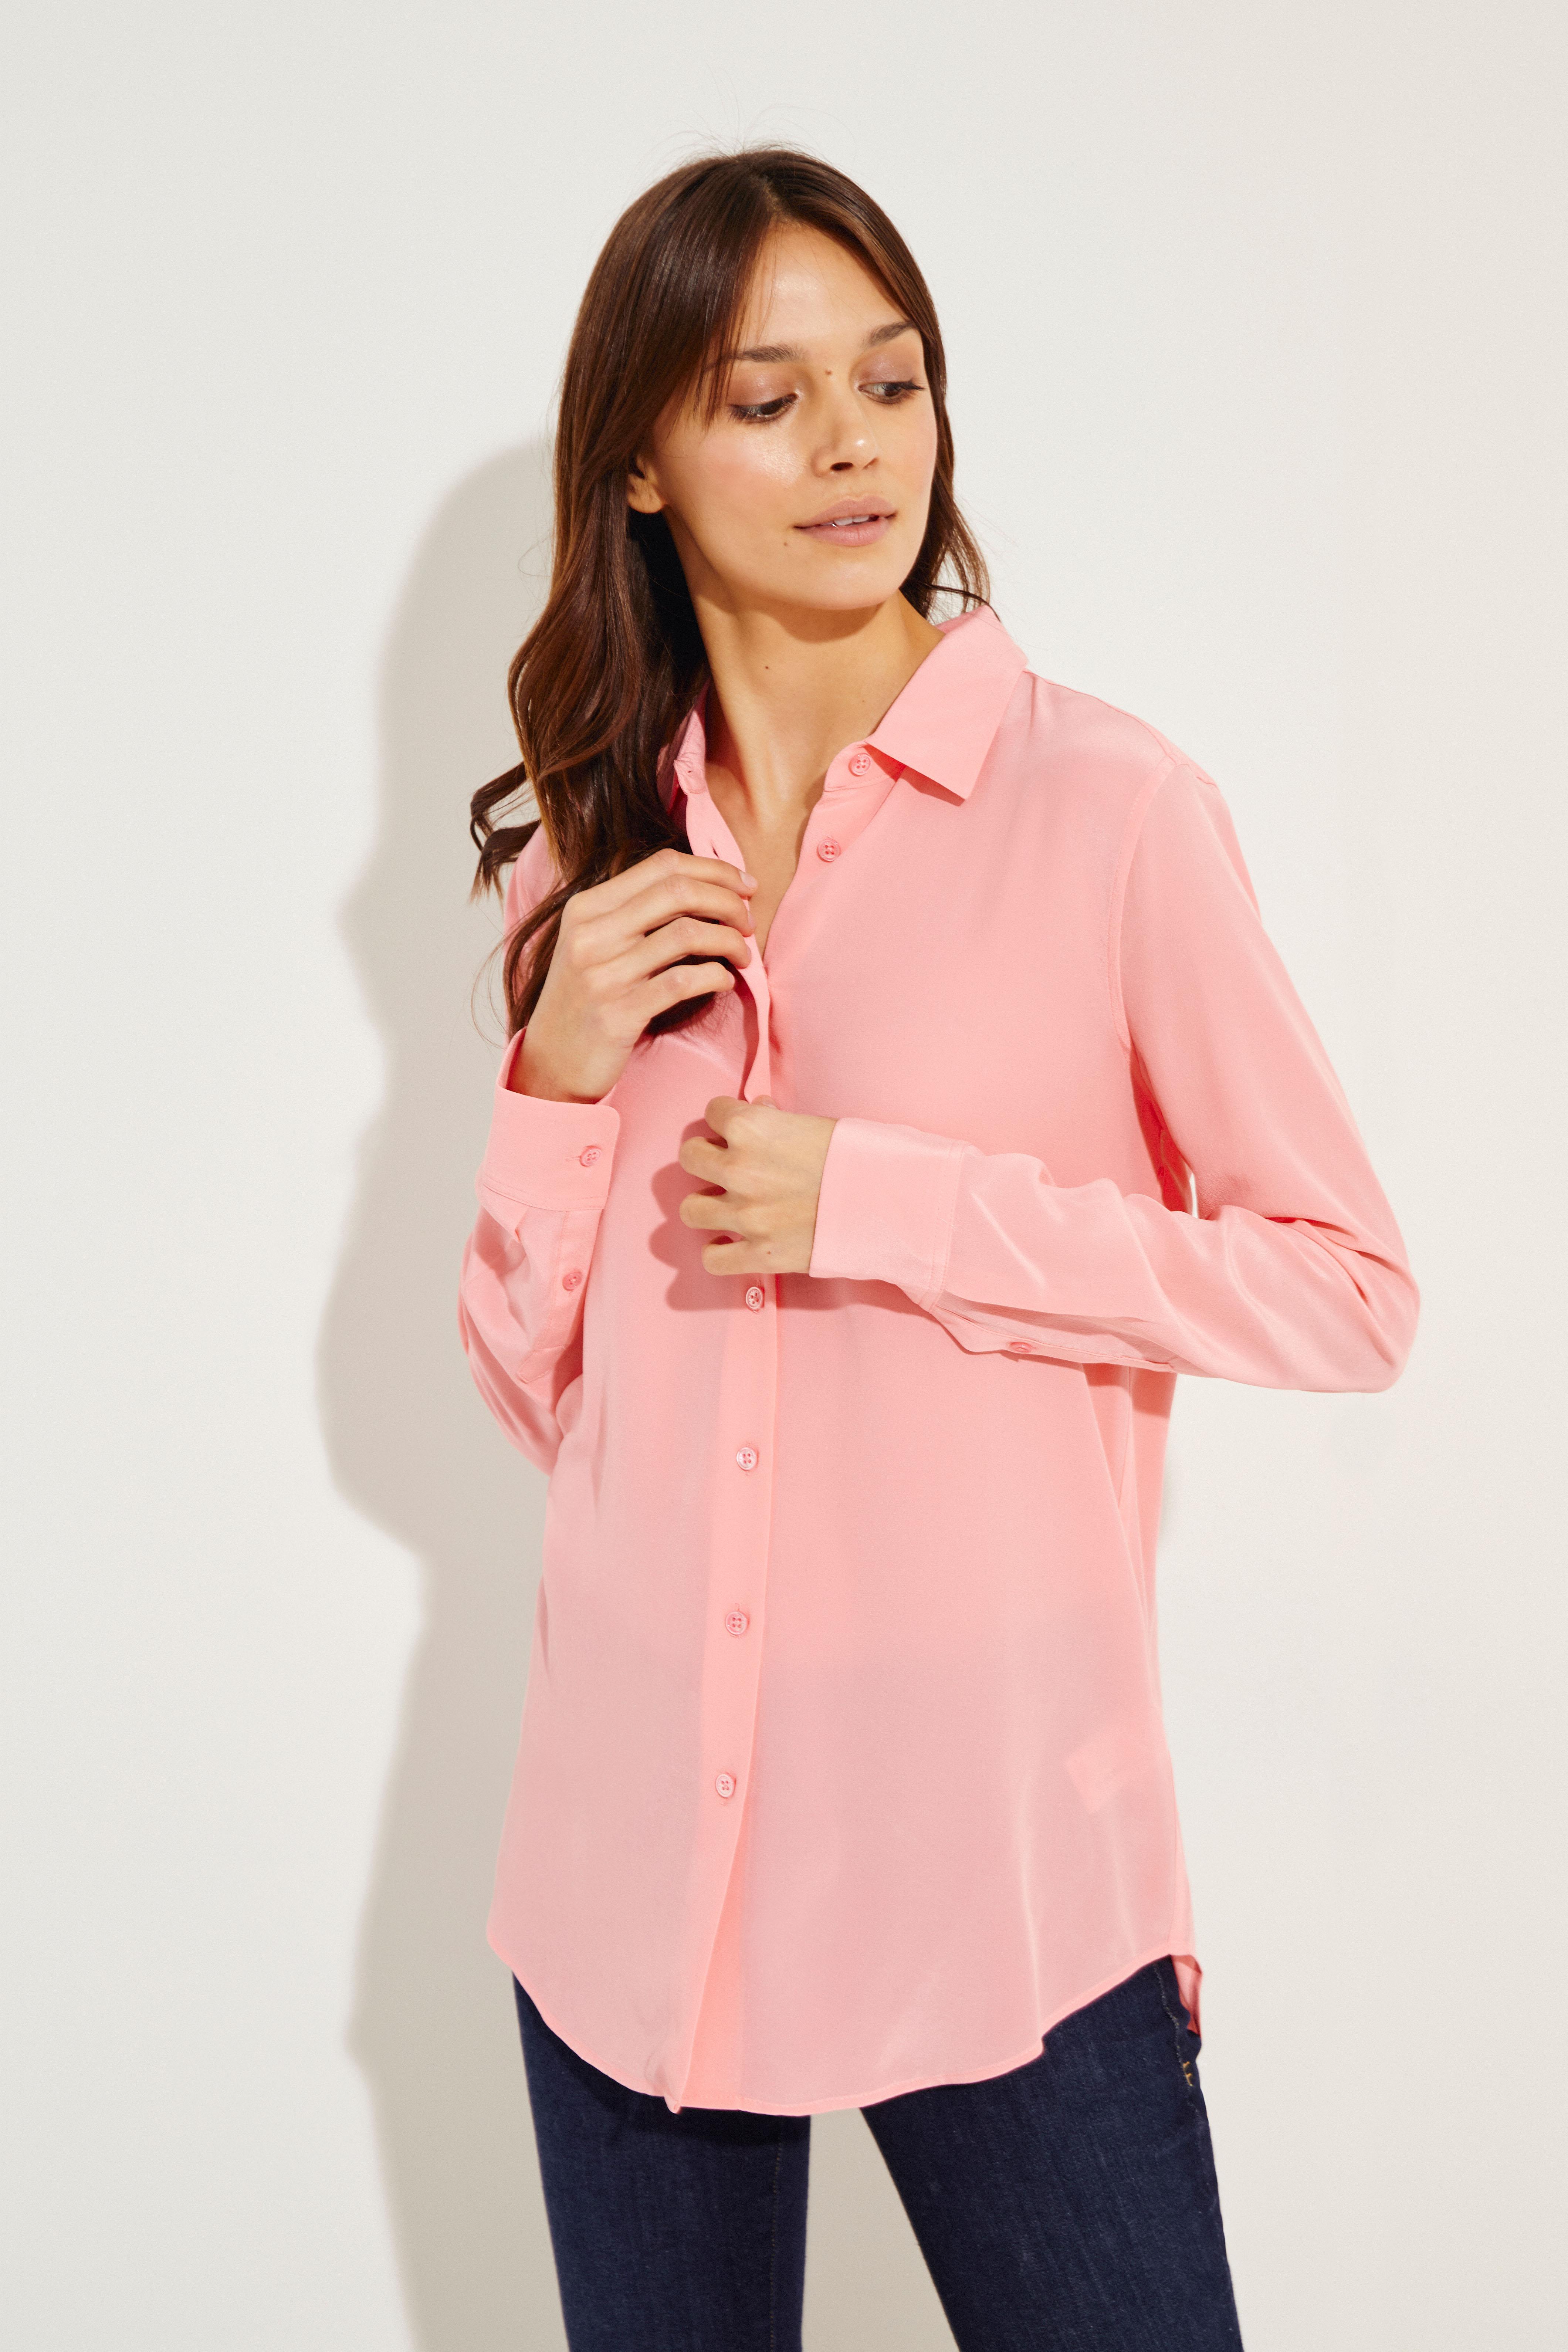 371e04a0e22e5 Silk blouse  Essential  Pink